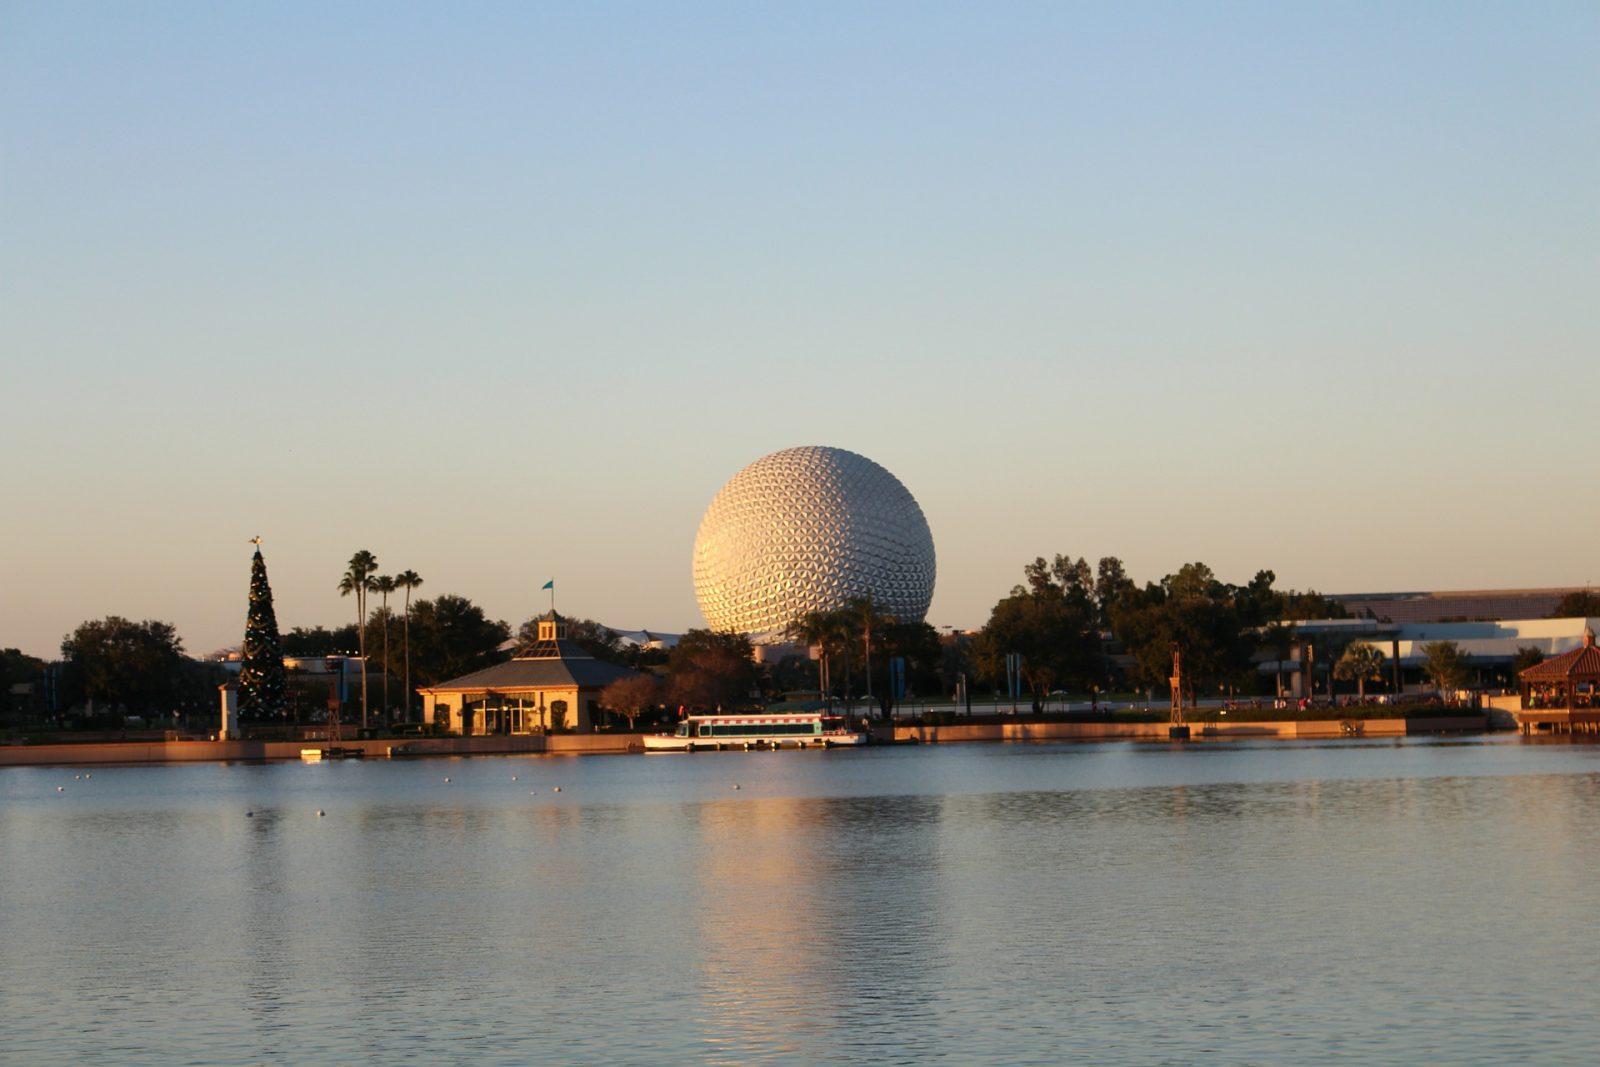 What to do in Orlando: Epcot Park at Walt Disney Orlando